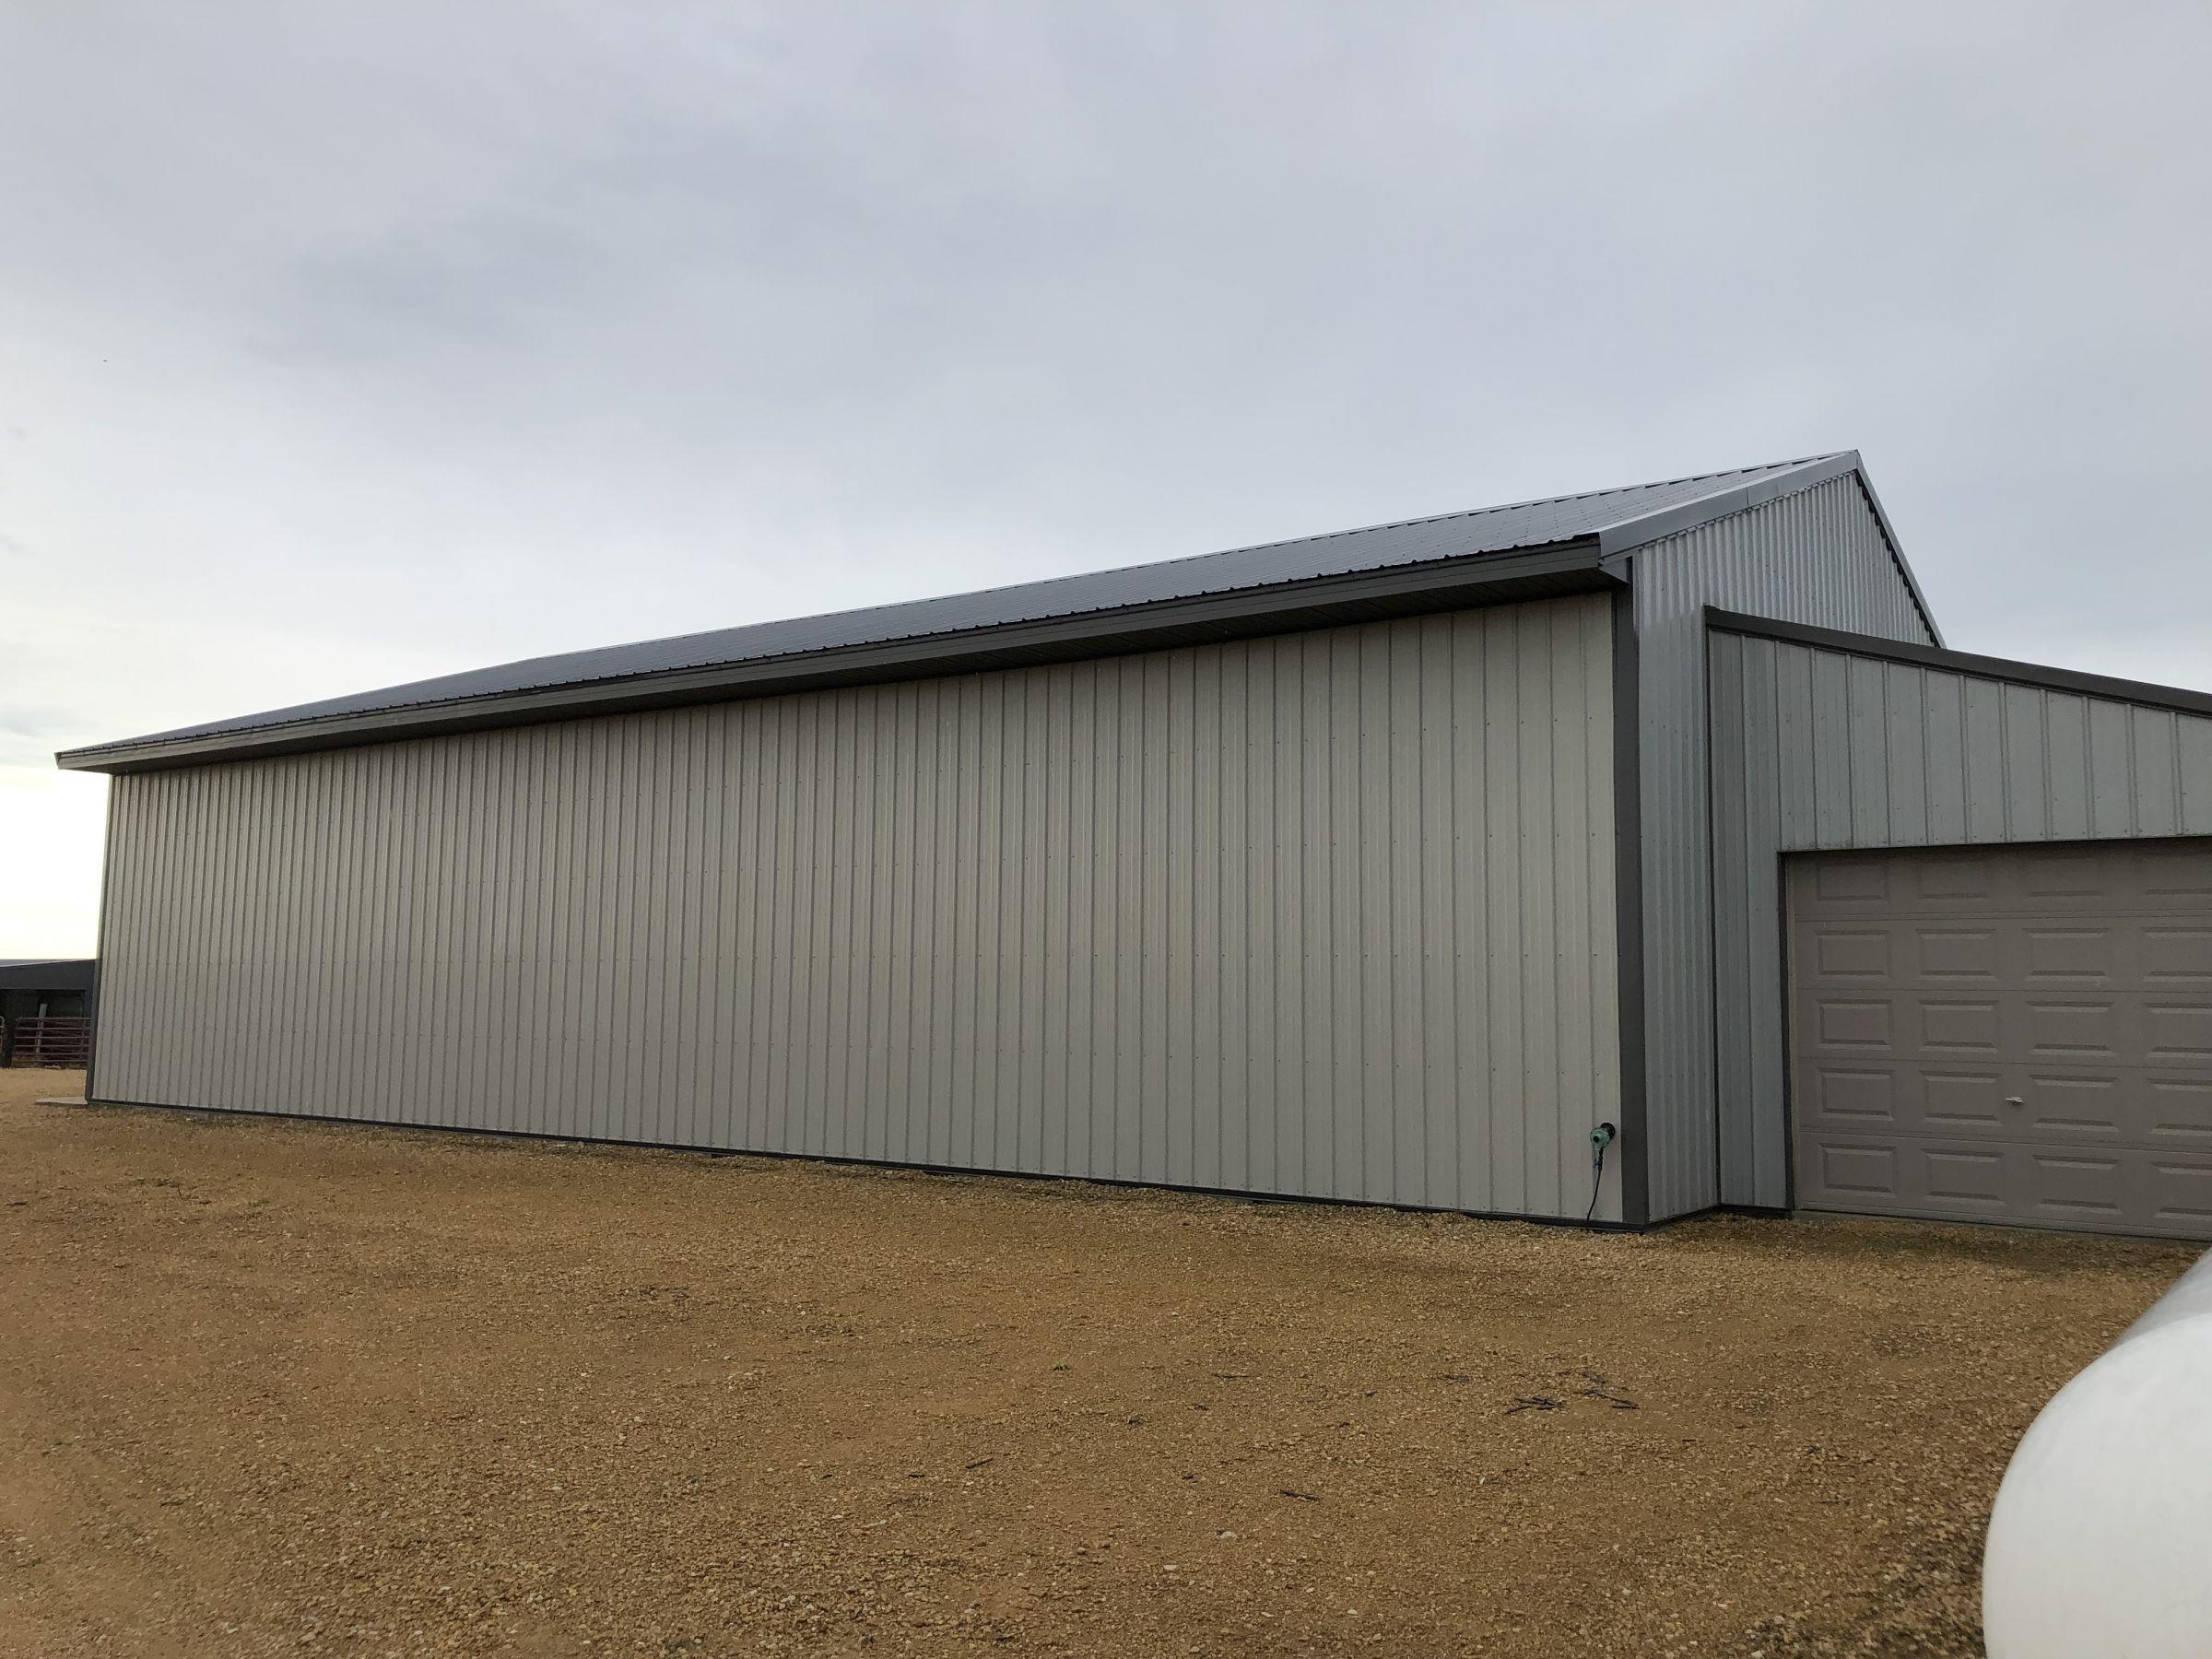 land-jackson-county-iowa-100-acres-listing-number-15703-0-2021-09-03-144528.jpg